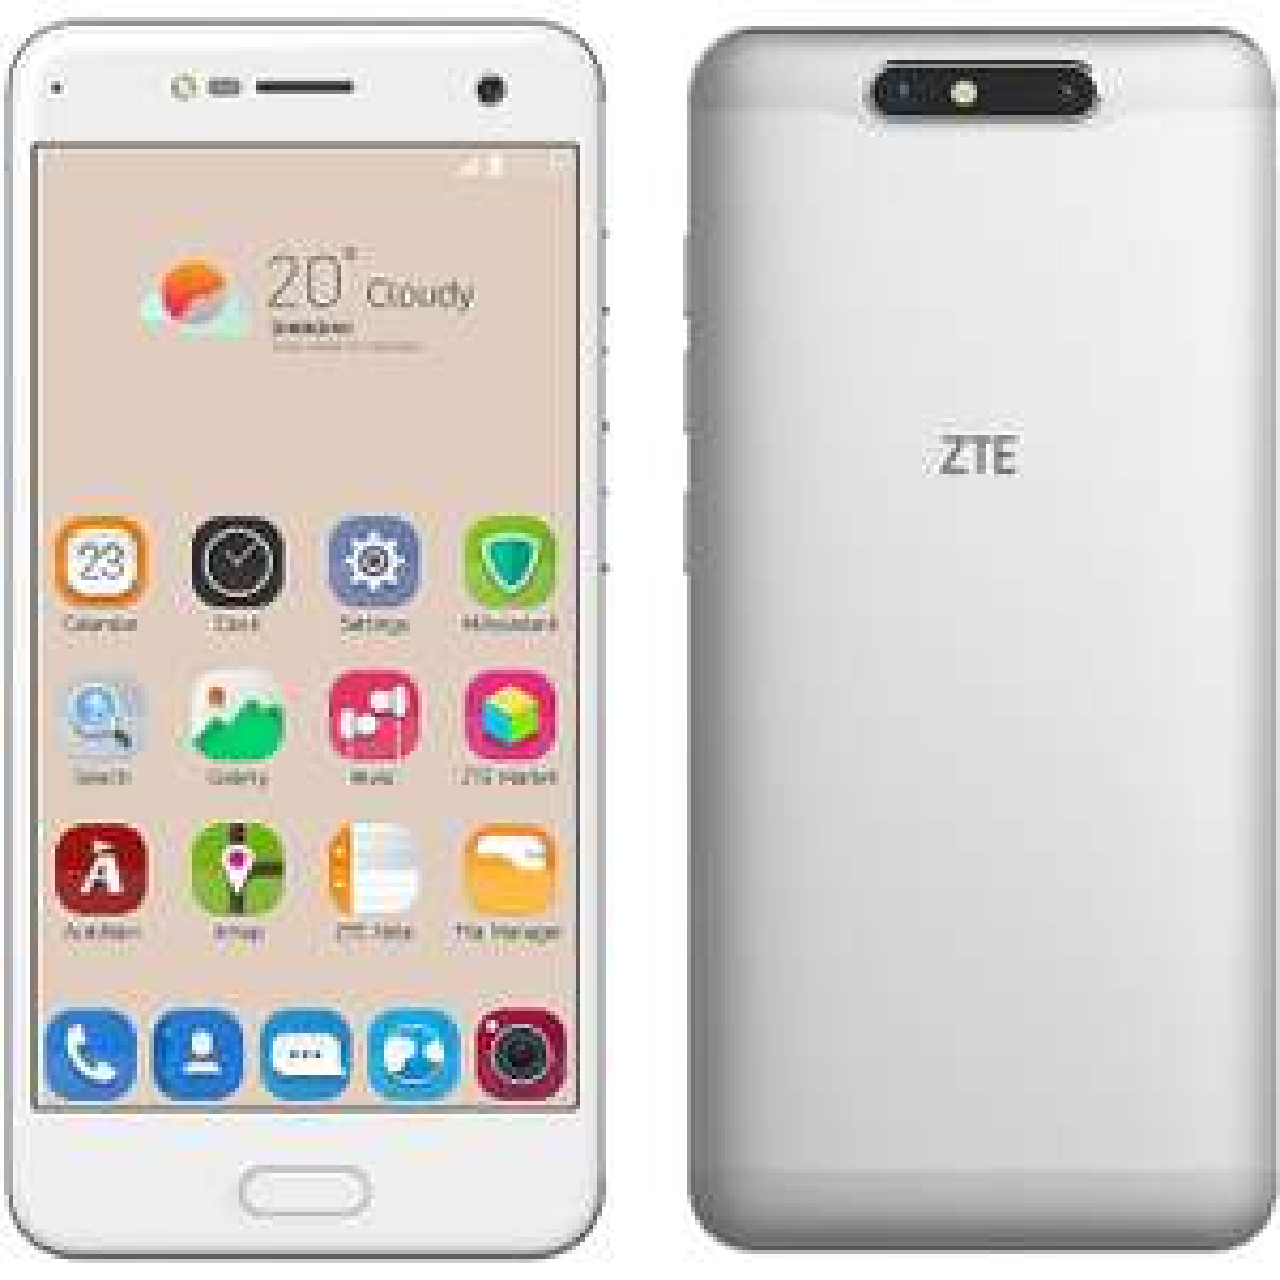 "ZTE Blade V8 5.2"" FHD Display, 2GB/16GB, SD435, FP, Silver, aluminium body, £49 @ AO"